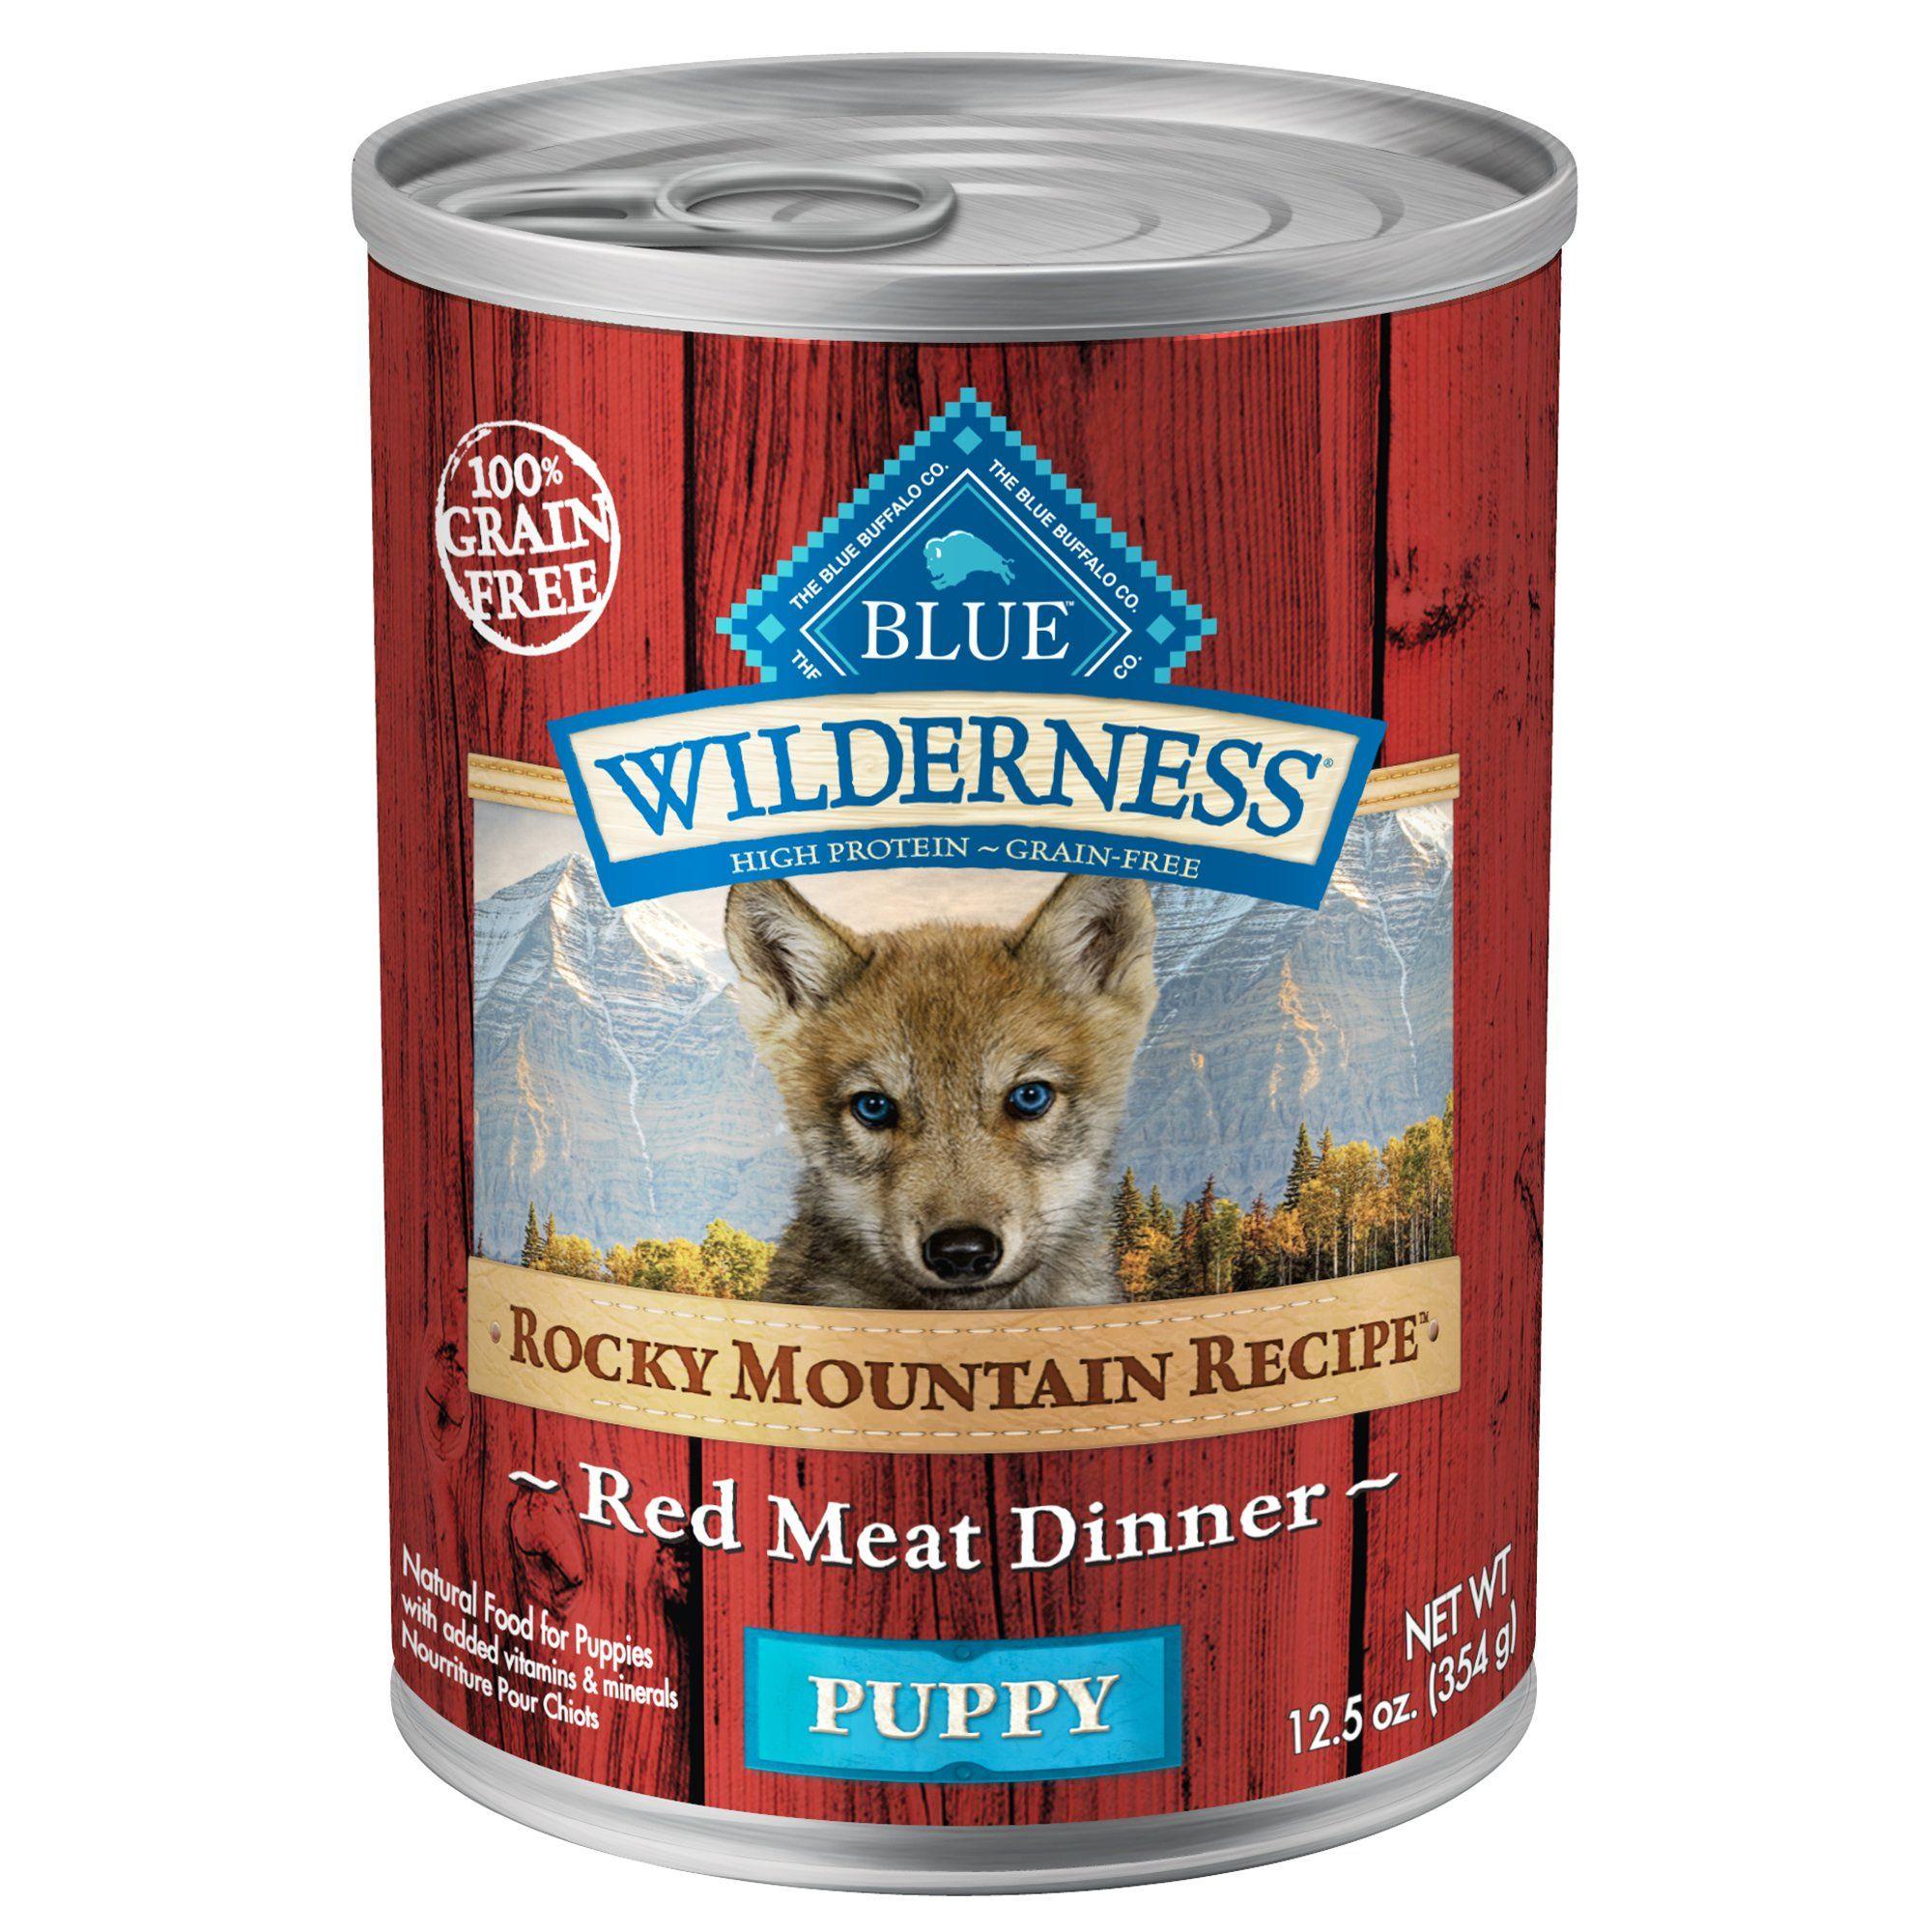 Blue buffalo blue wilderness rocky mountain recipe red